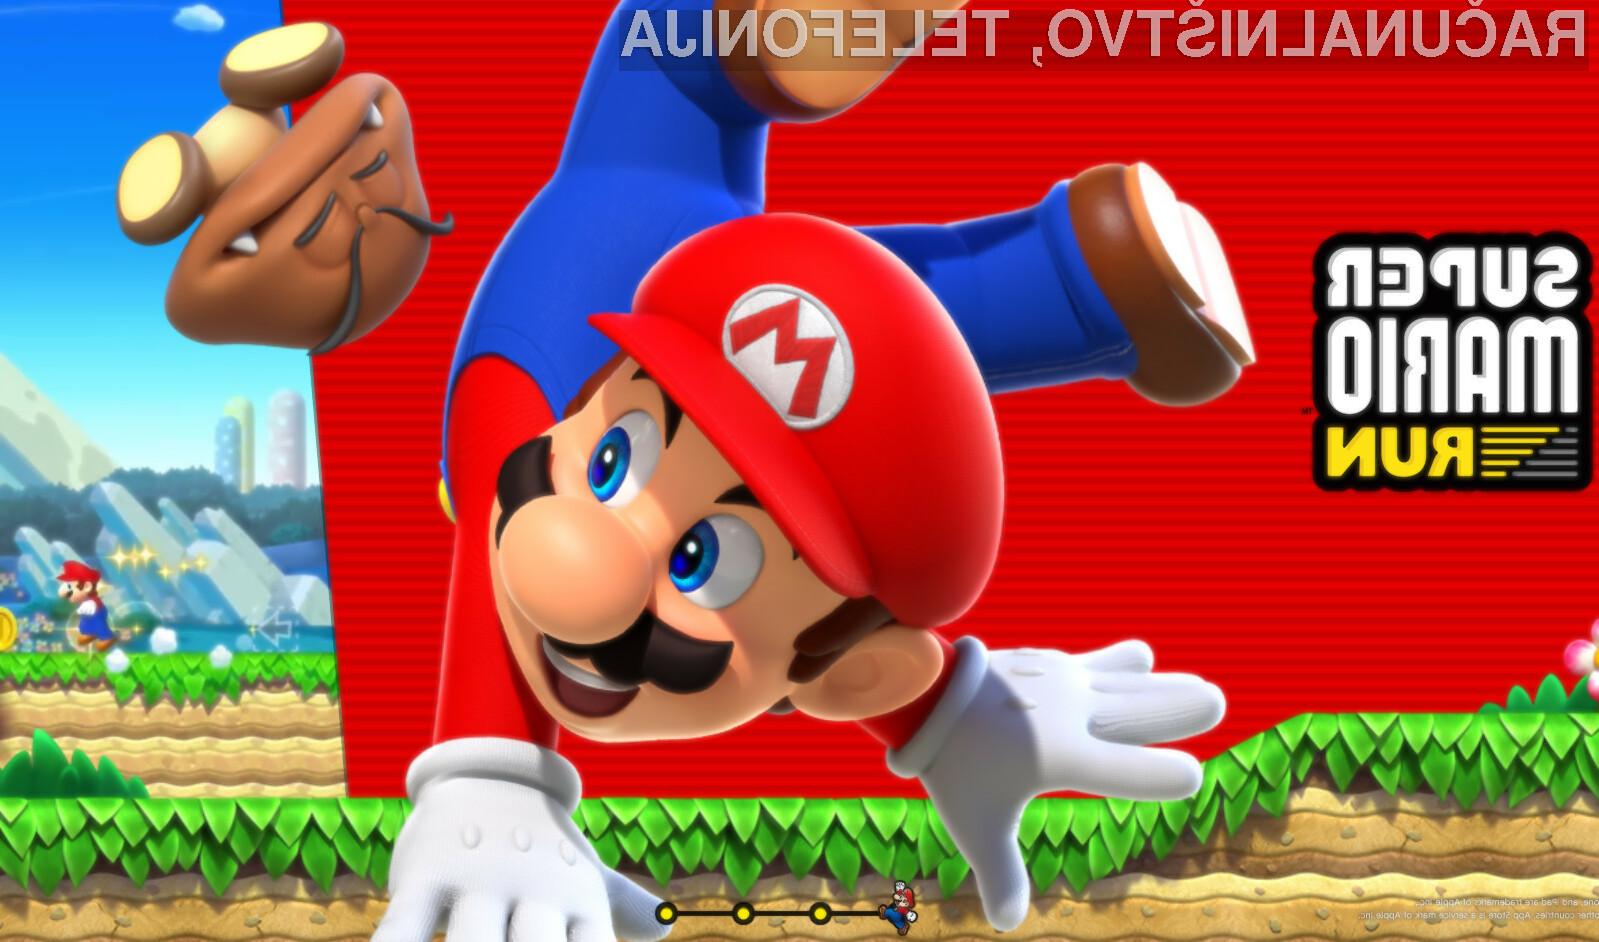 Pozor. Prihaja novi Super Mario za pametne telefone!